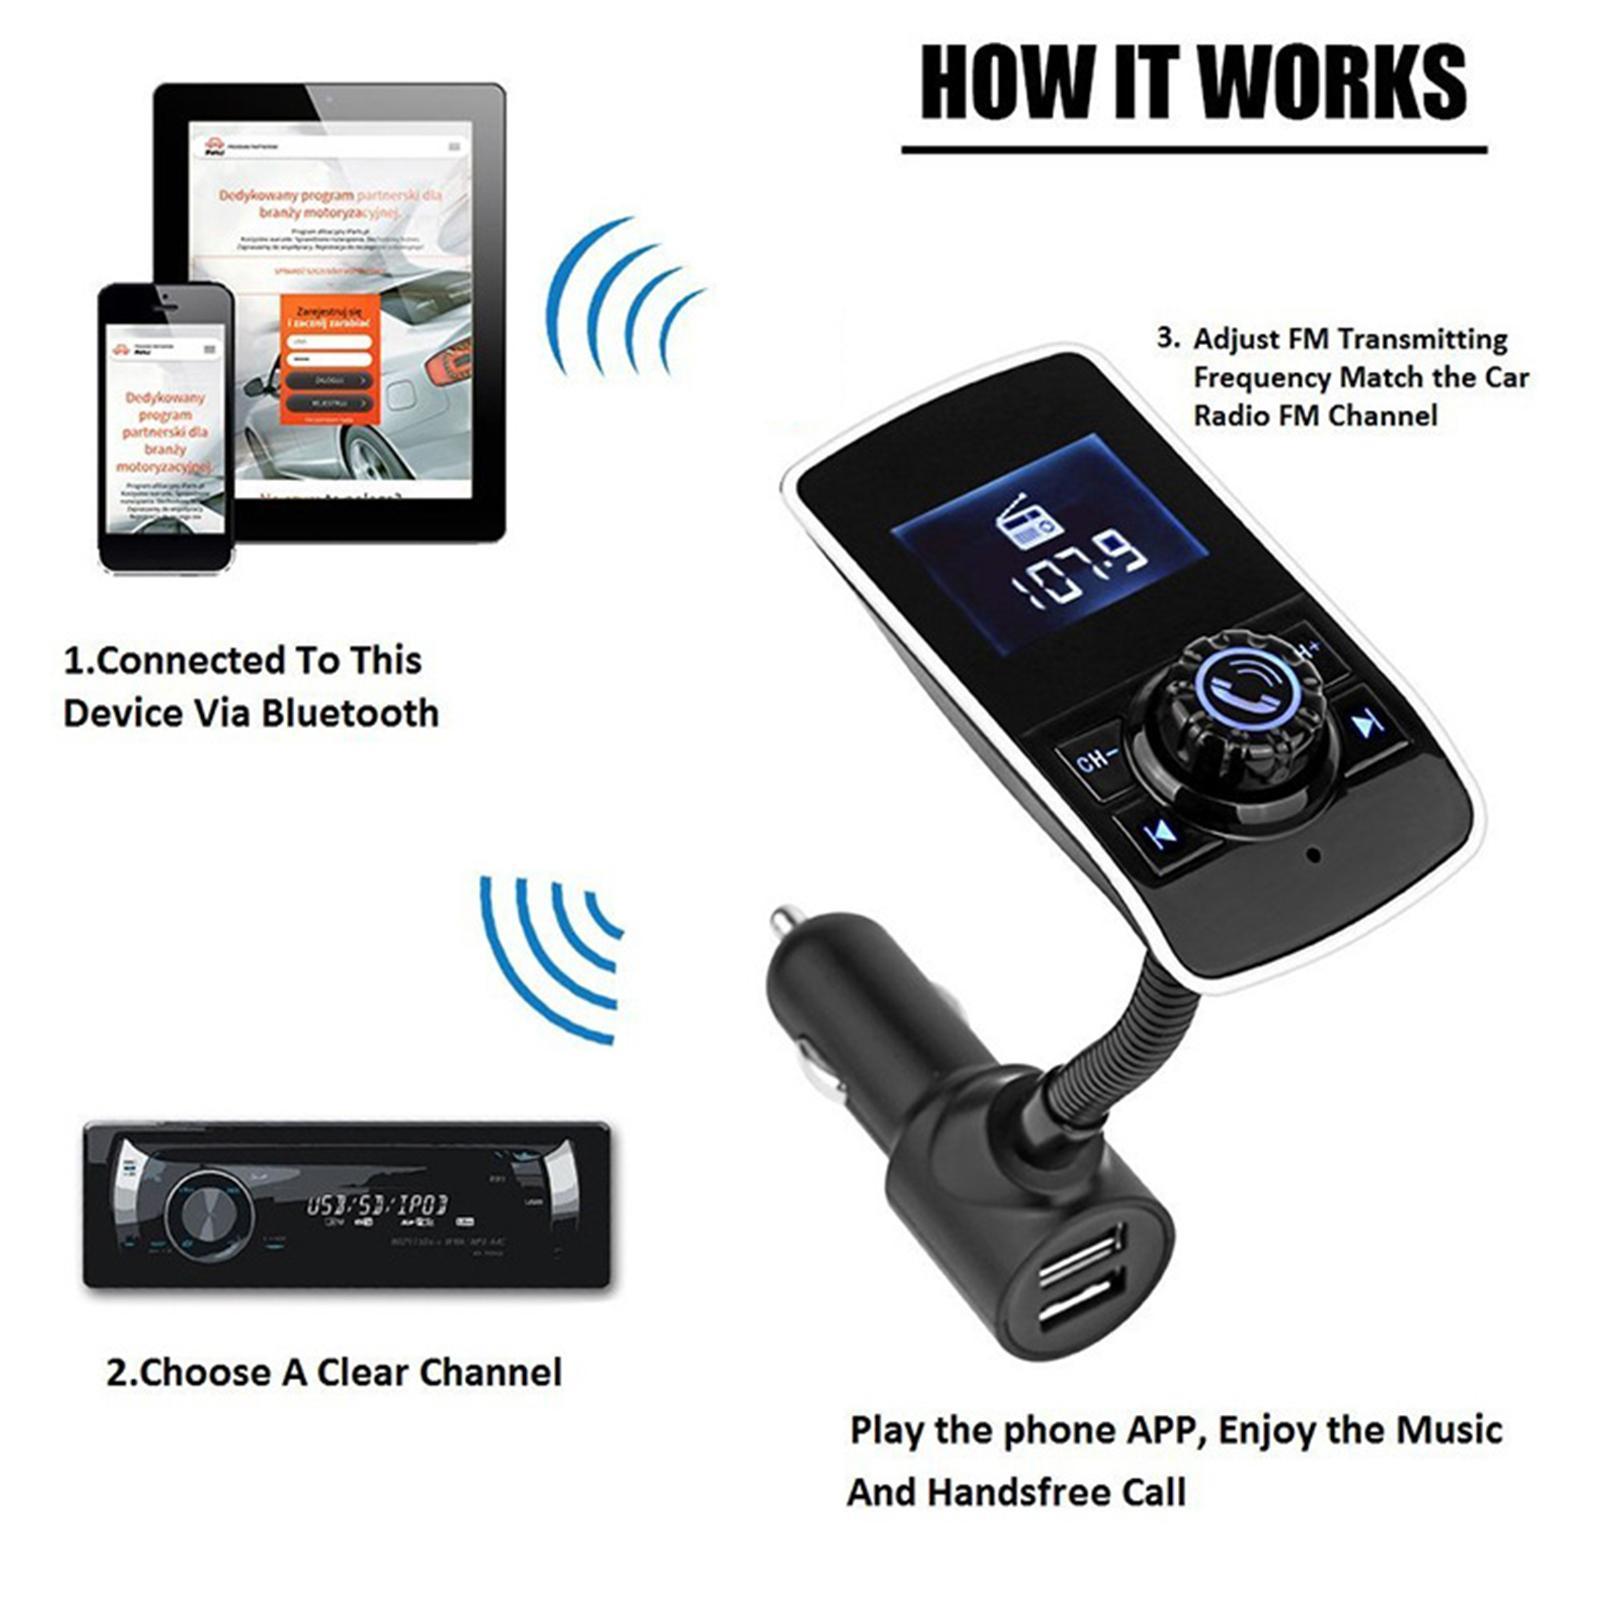 LCD Auto FM Transmitter Radio Auto MP3 Player 2 Port USB Ladegerät mit Mikrofon